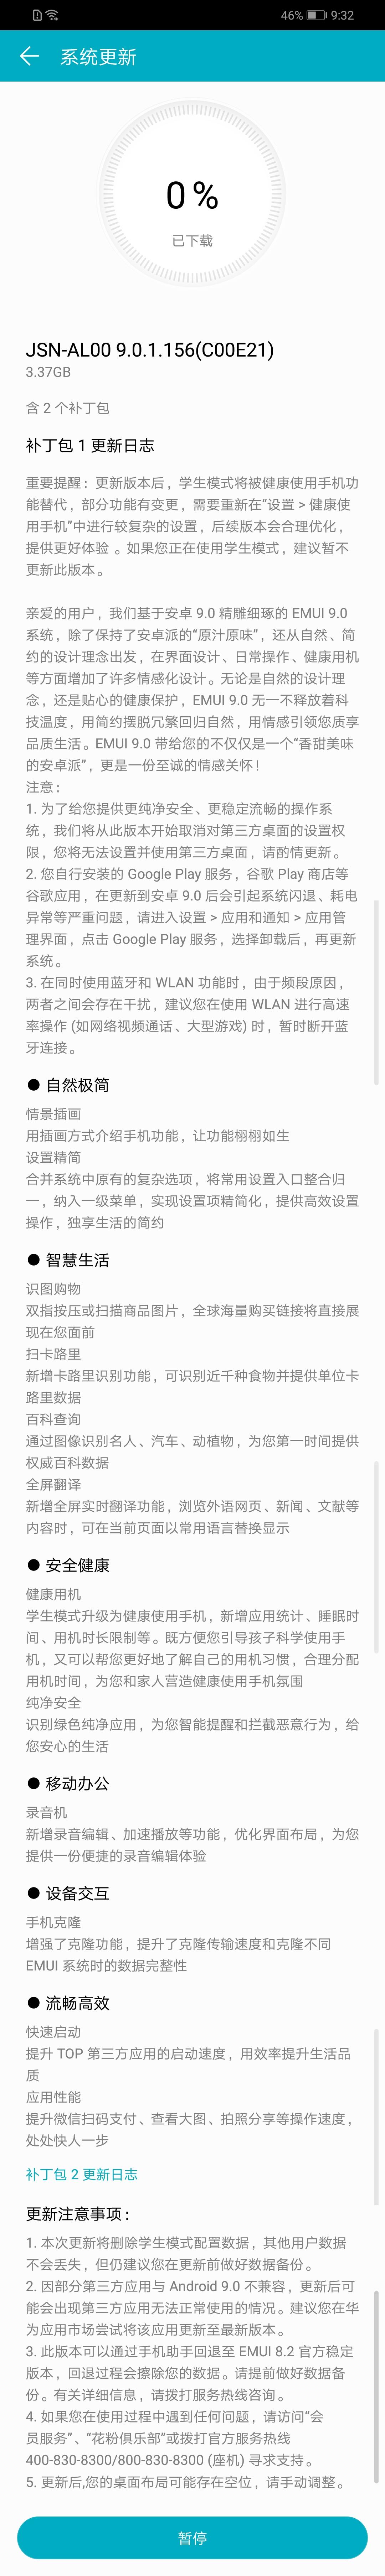 Screenshot_2019-04-05-21-32-46_com.huawei.android.jpg